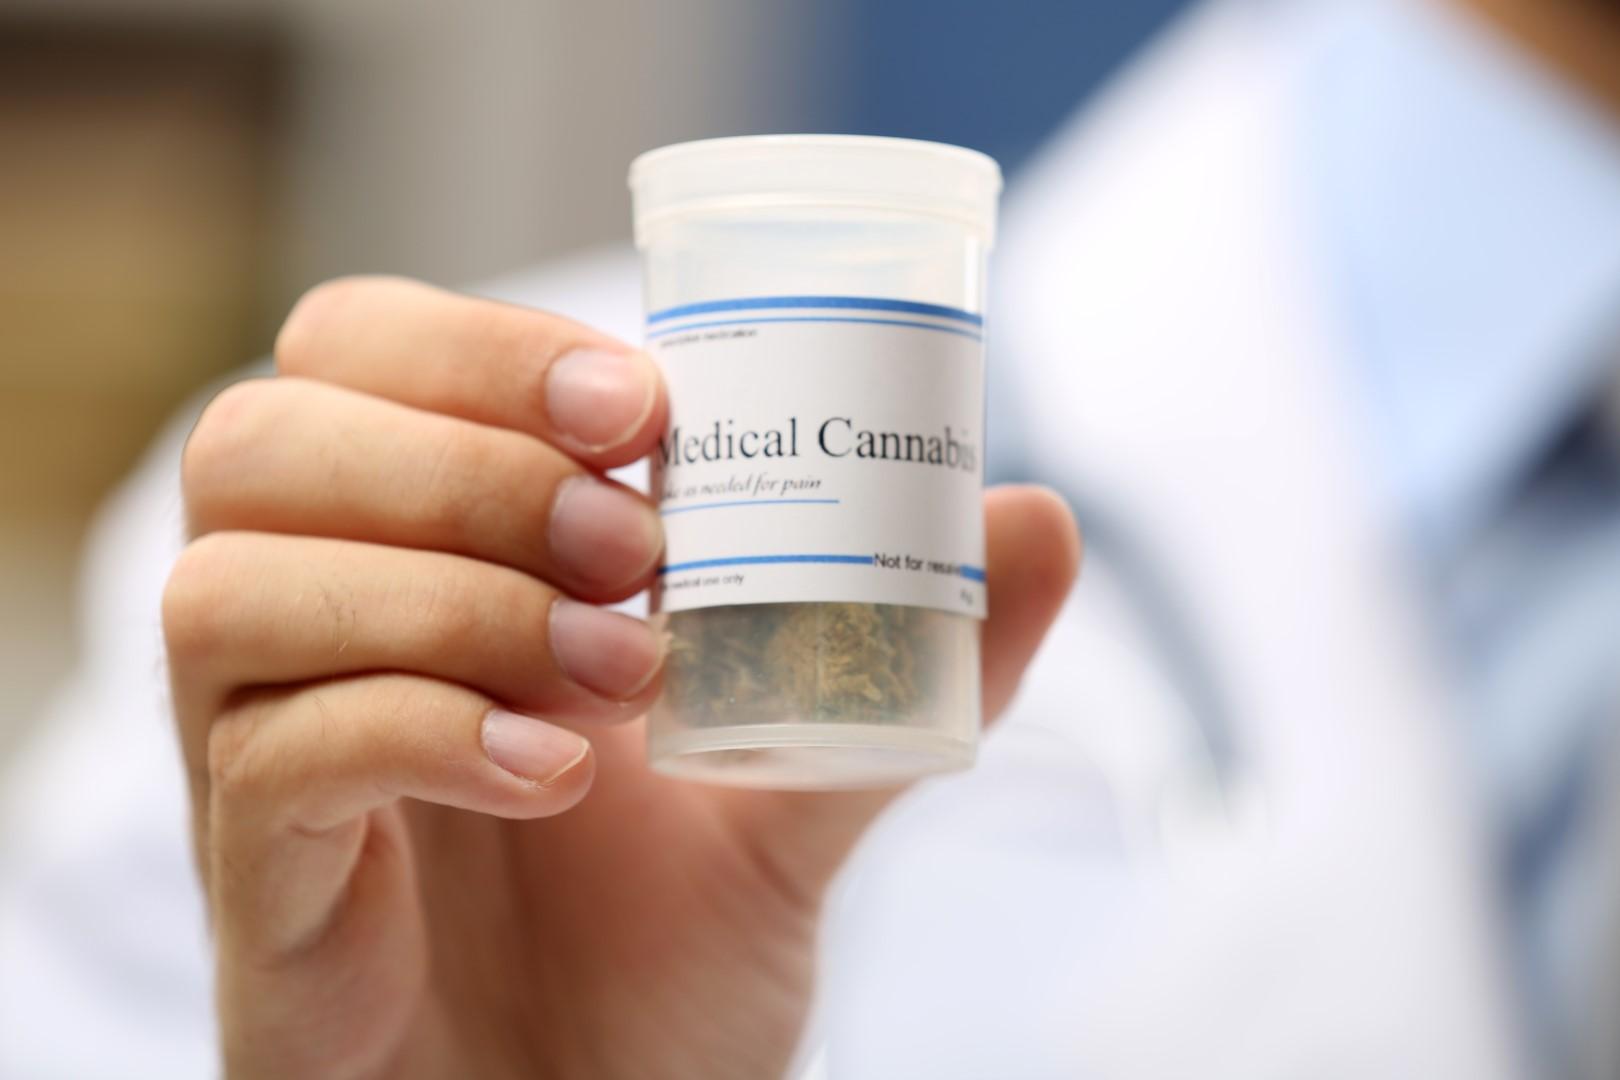 medical marijuana 06.14 (Large)